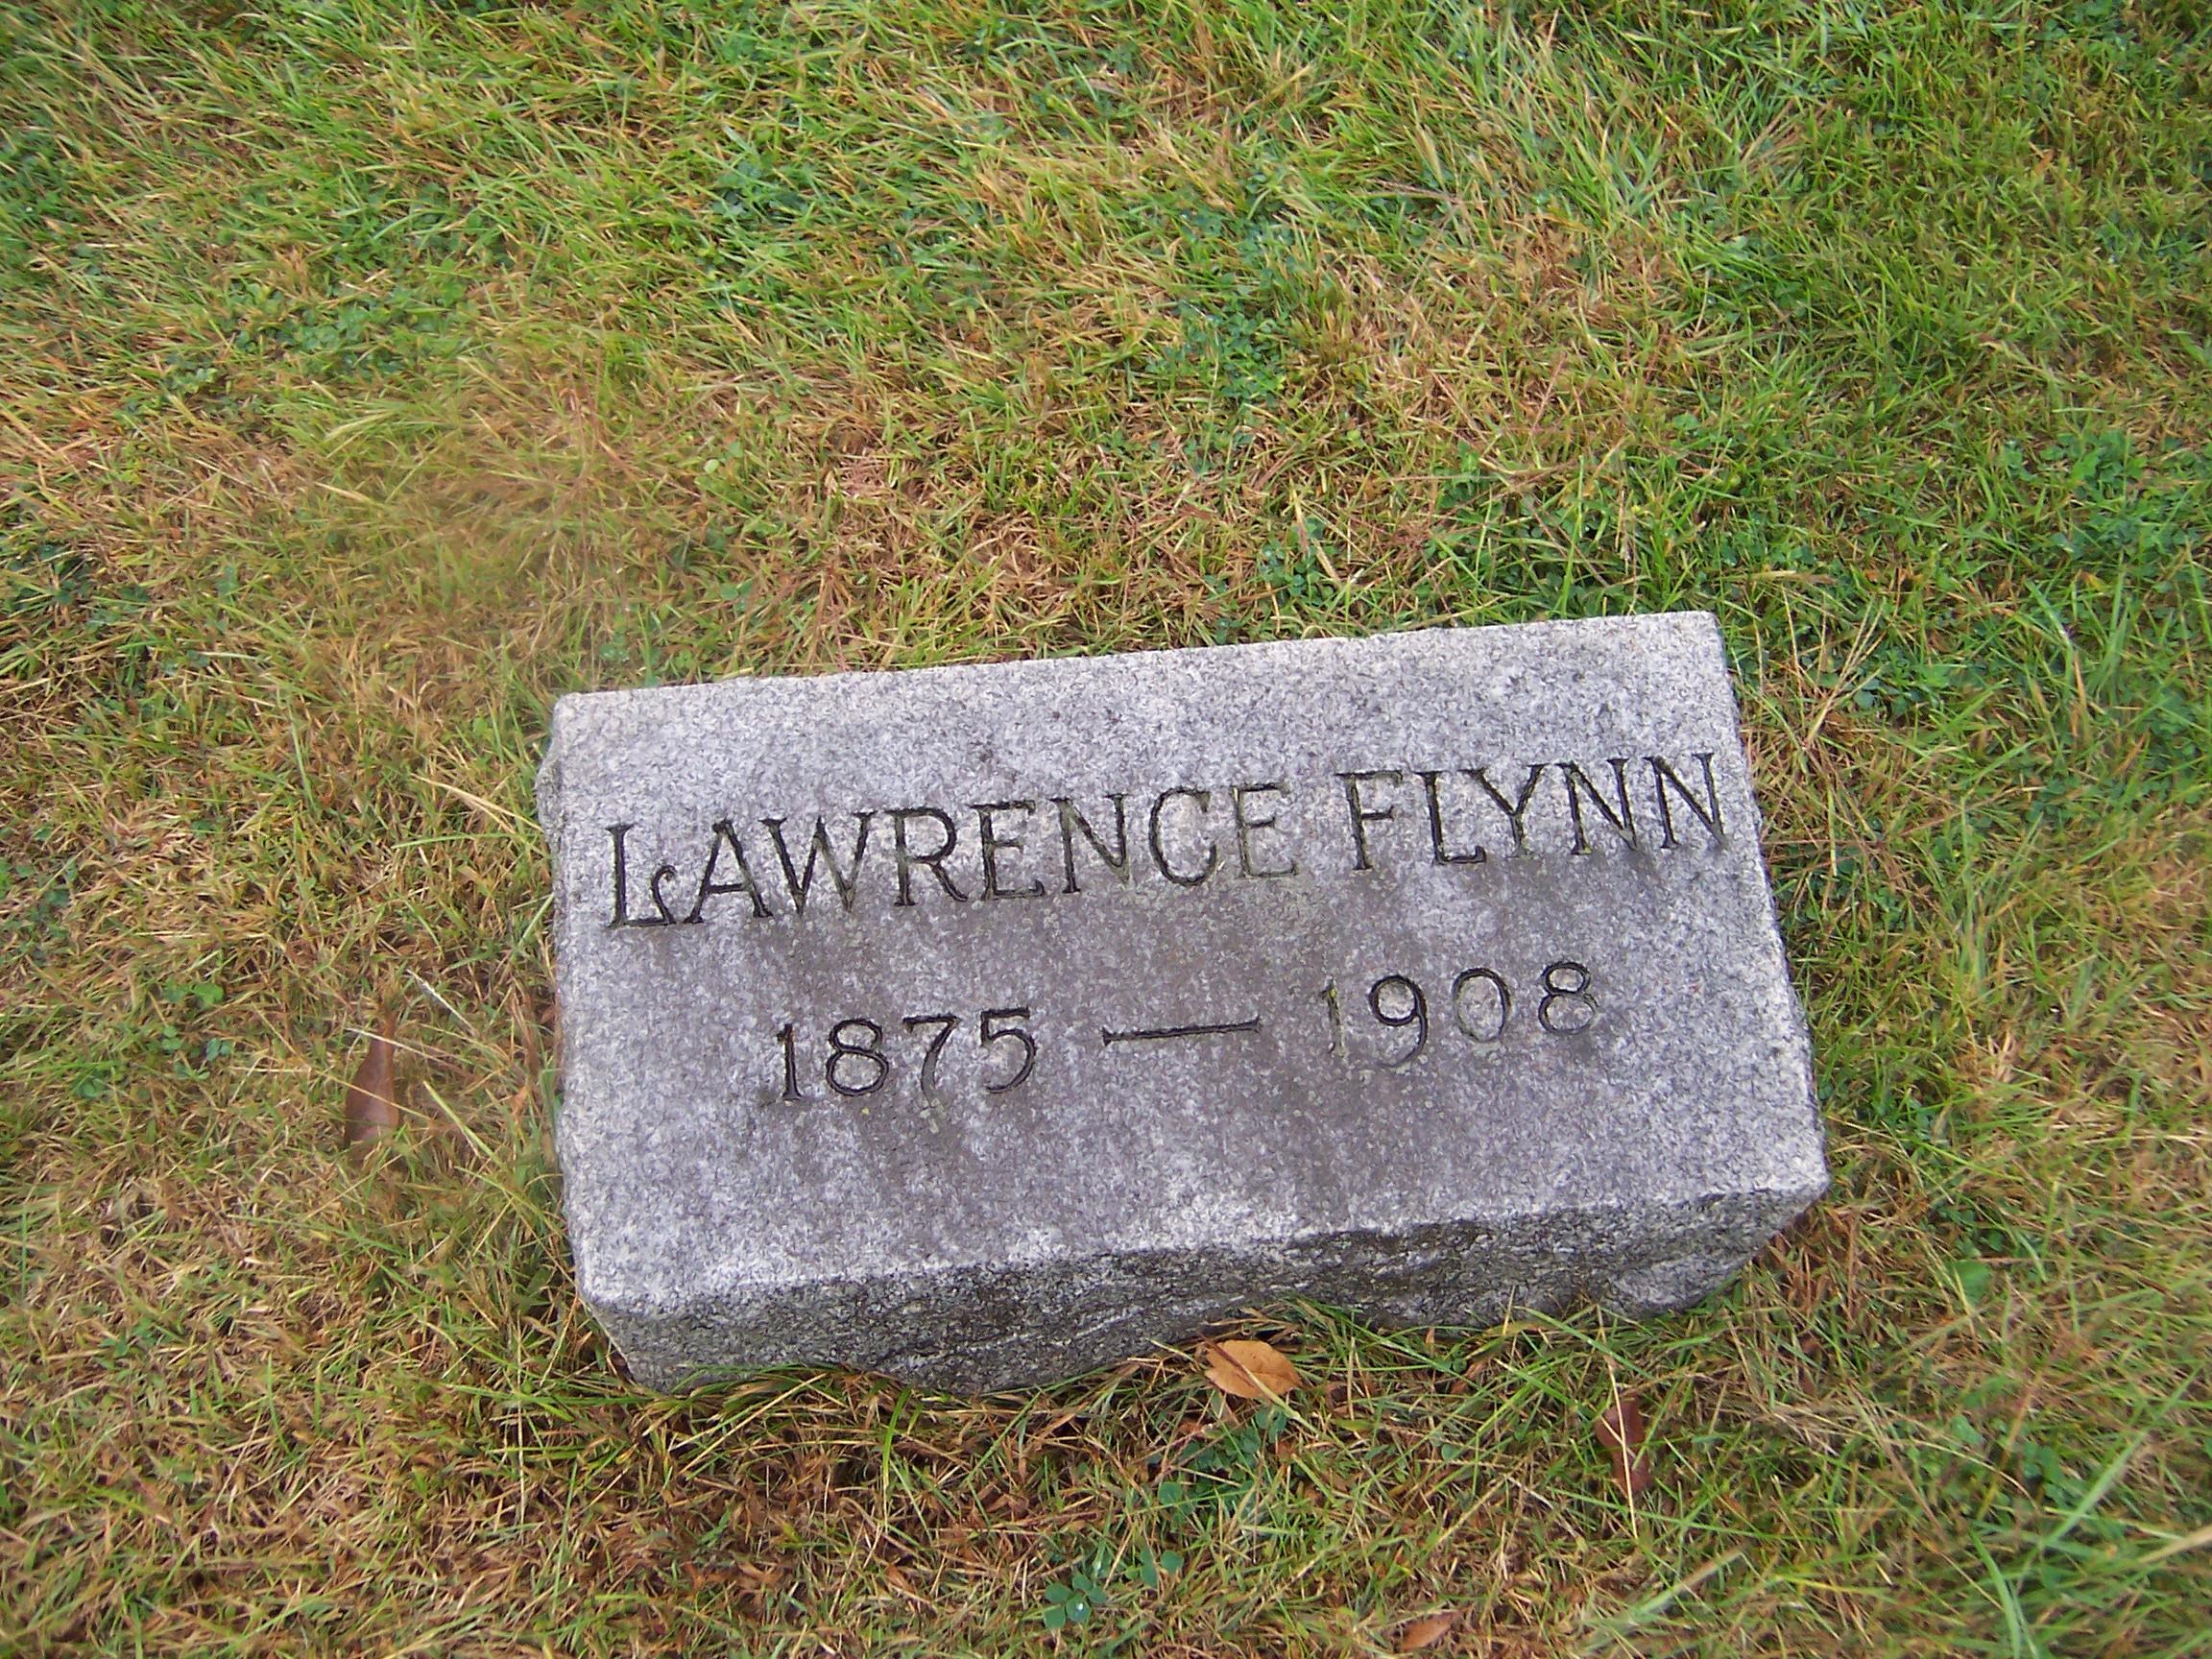 Lawrence Flynn